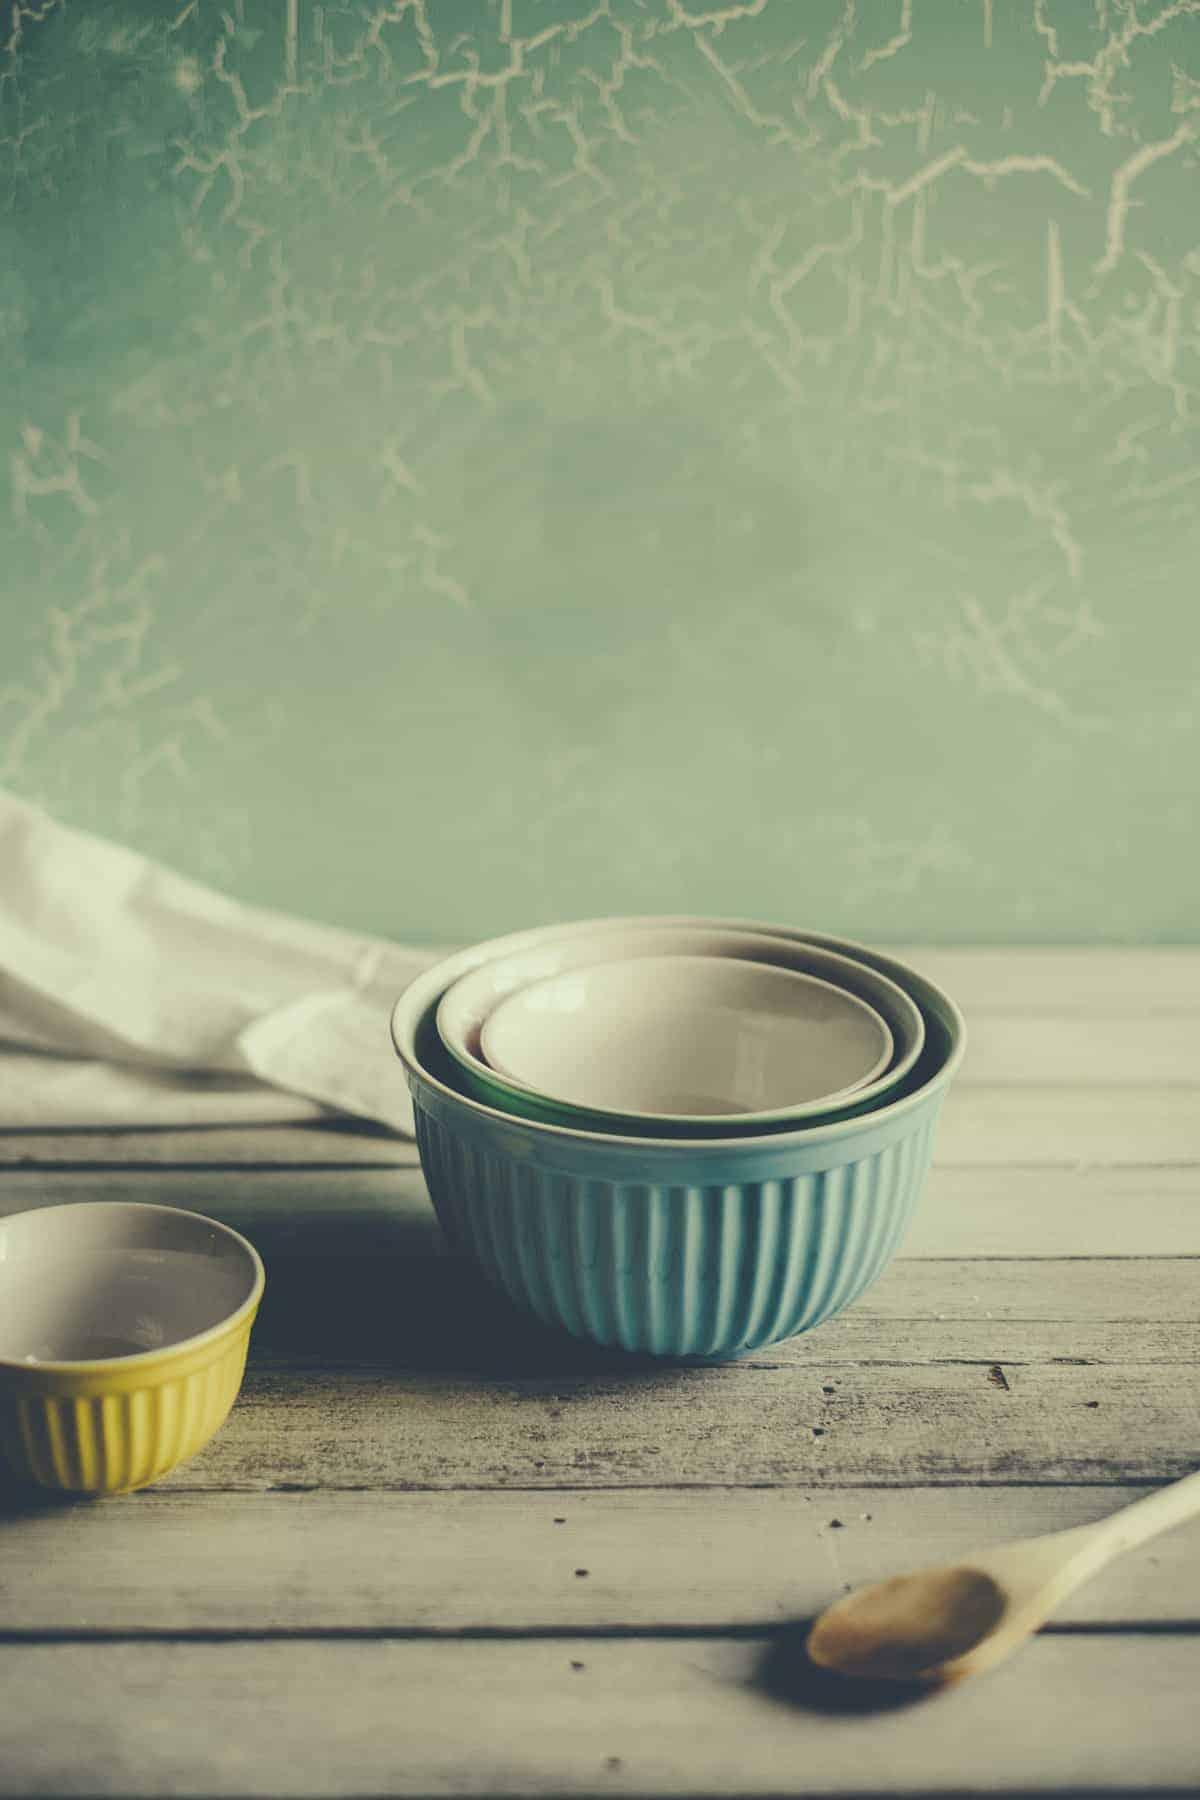 csr soft icing mixture instructions